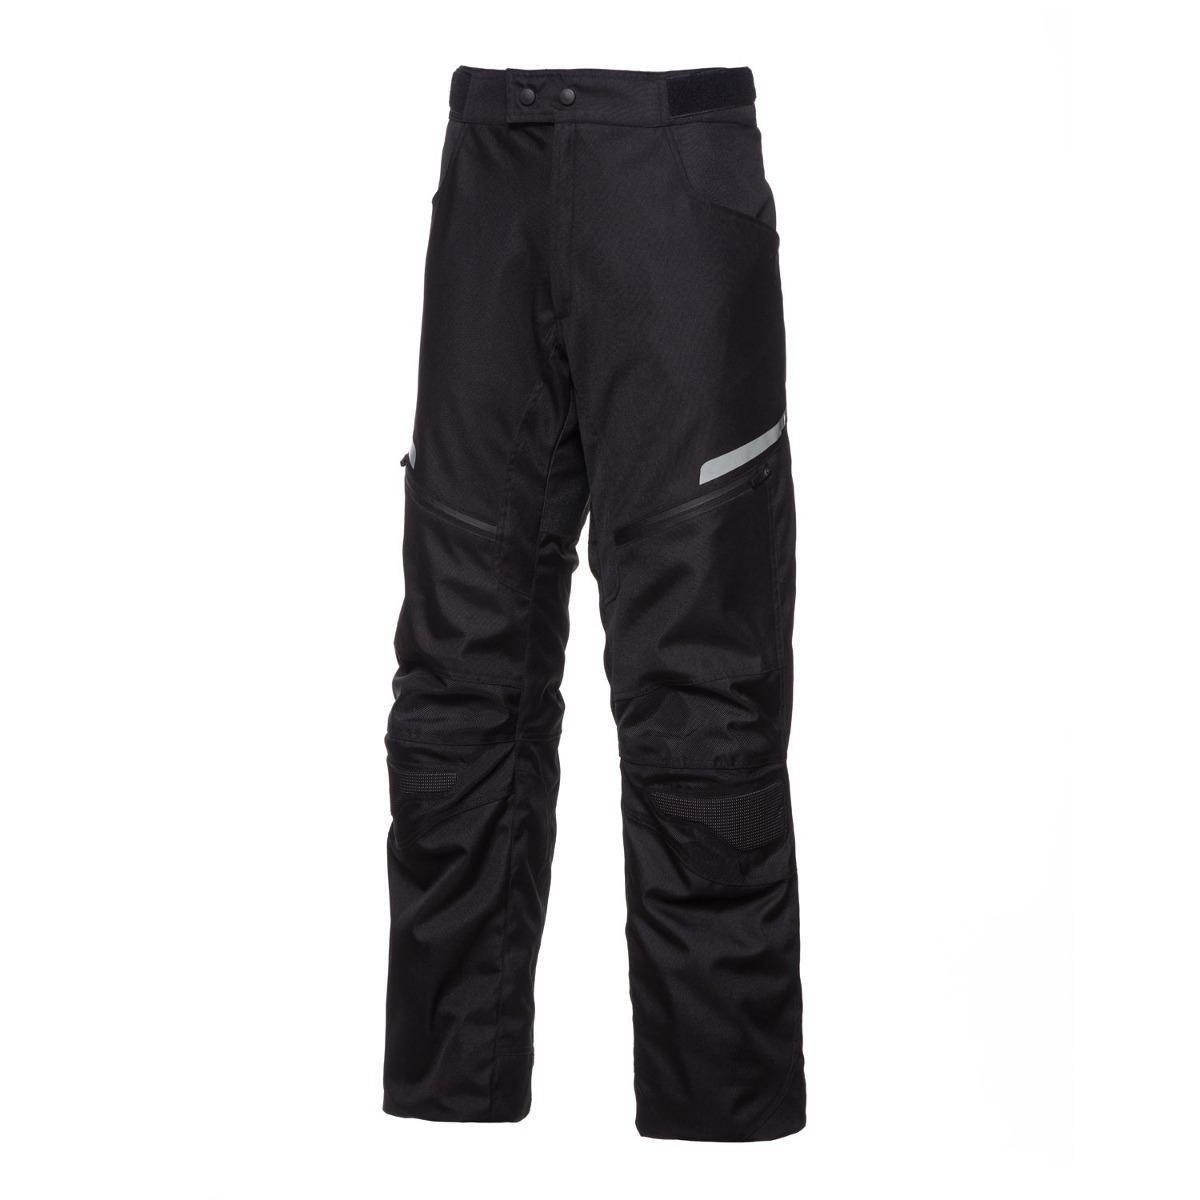 pantalon cordura fuse nineTOone by ls2 negro talle l